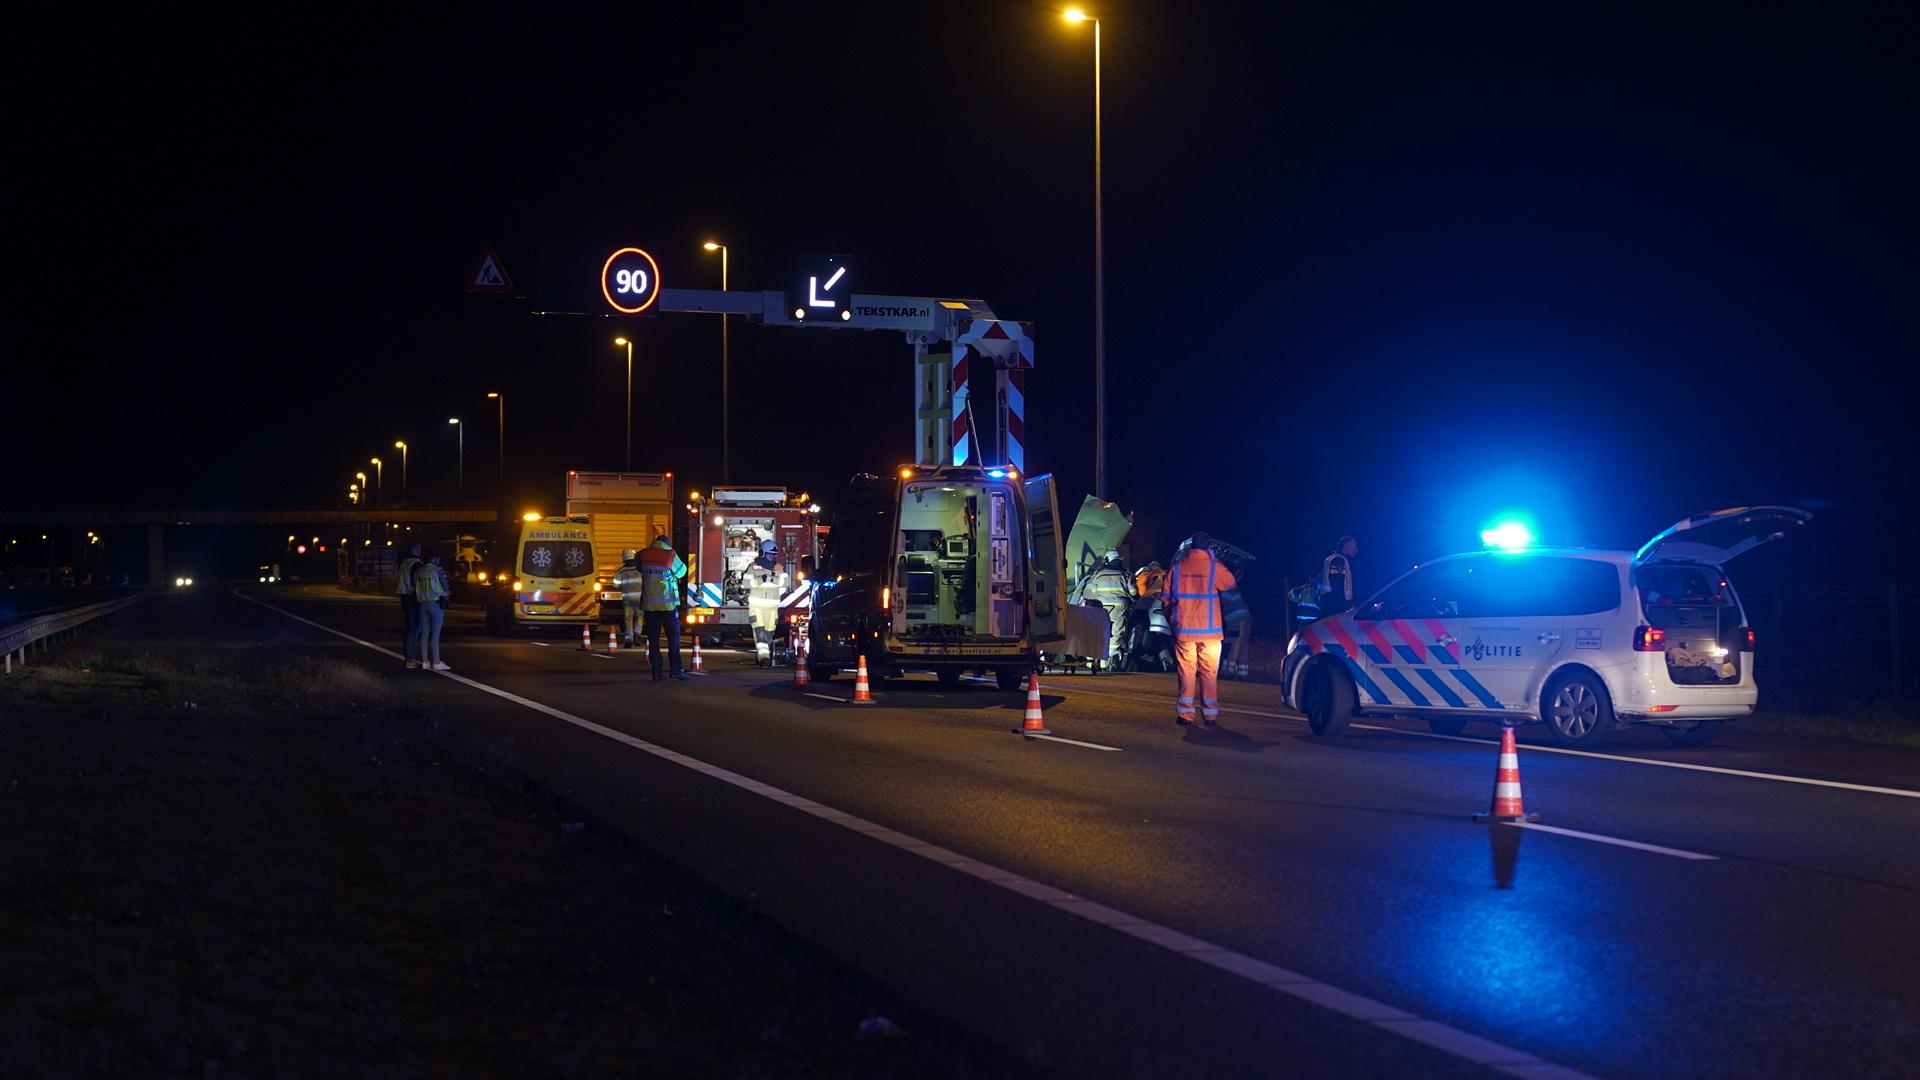 Automobilist gewond bij ongeluk op A1 bij Bathmen, snelweg afgesloten.